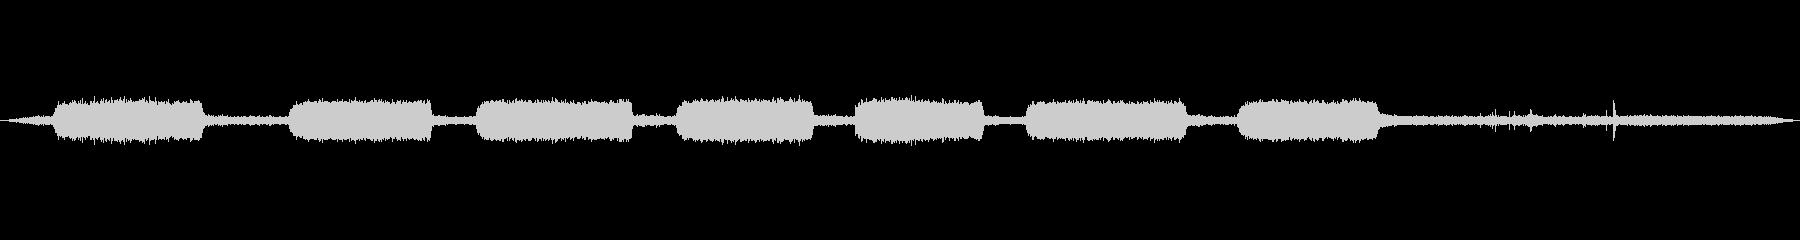 GLASSWORKSでのパターンの...の未再生の波形